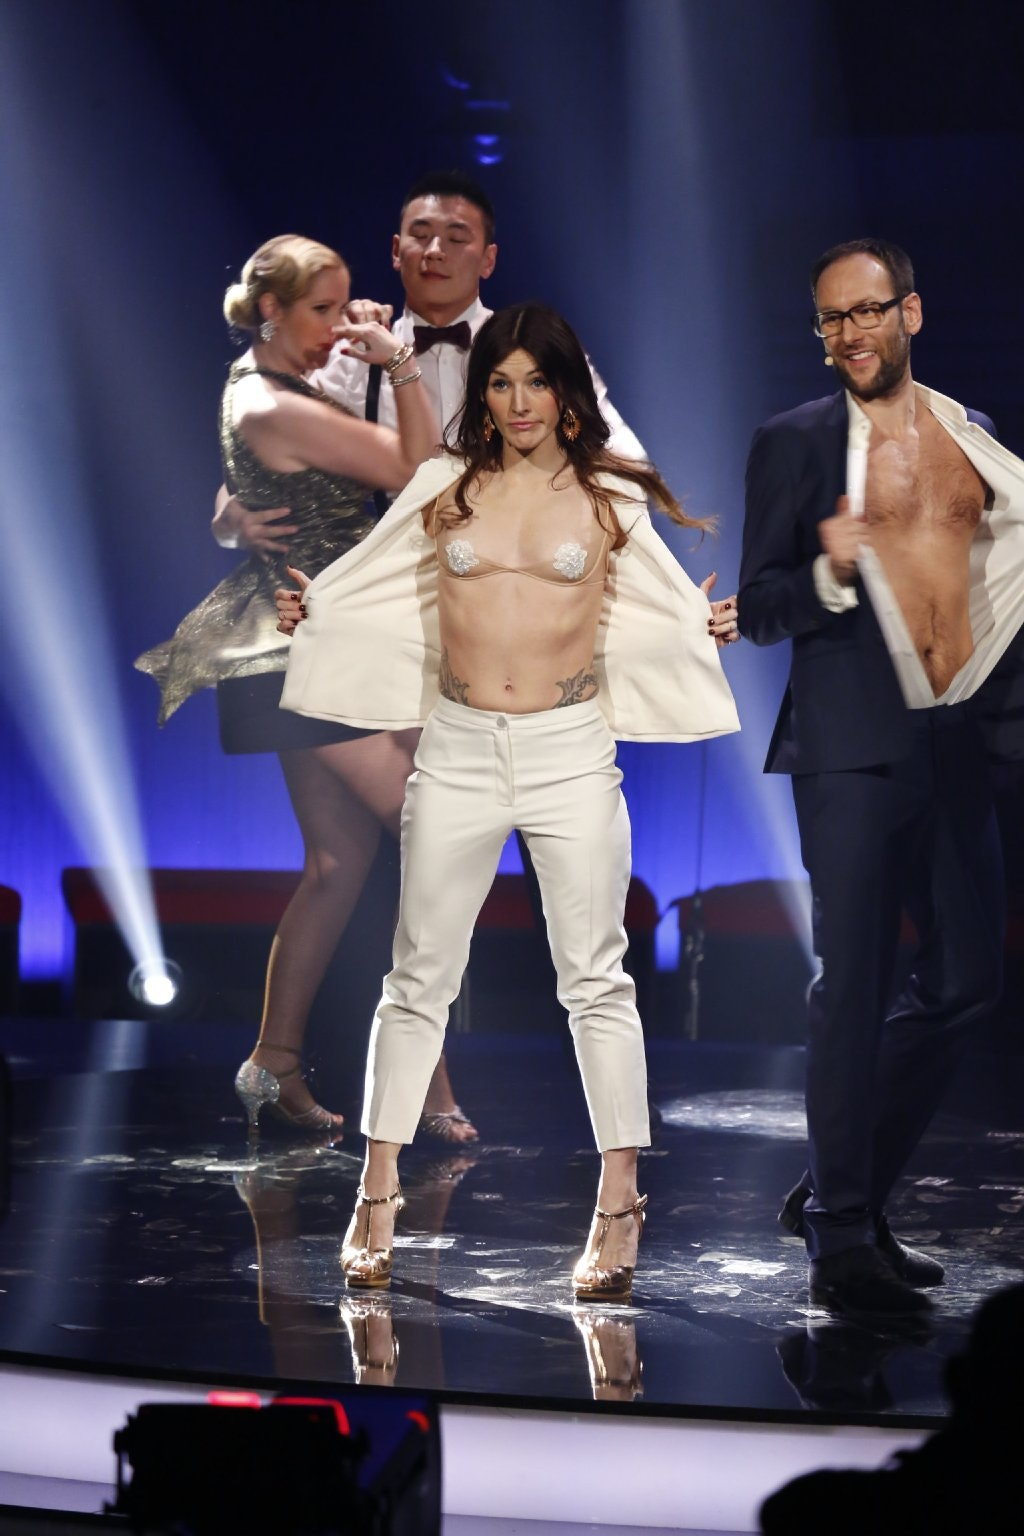 Jeannine michaelsen nackt